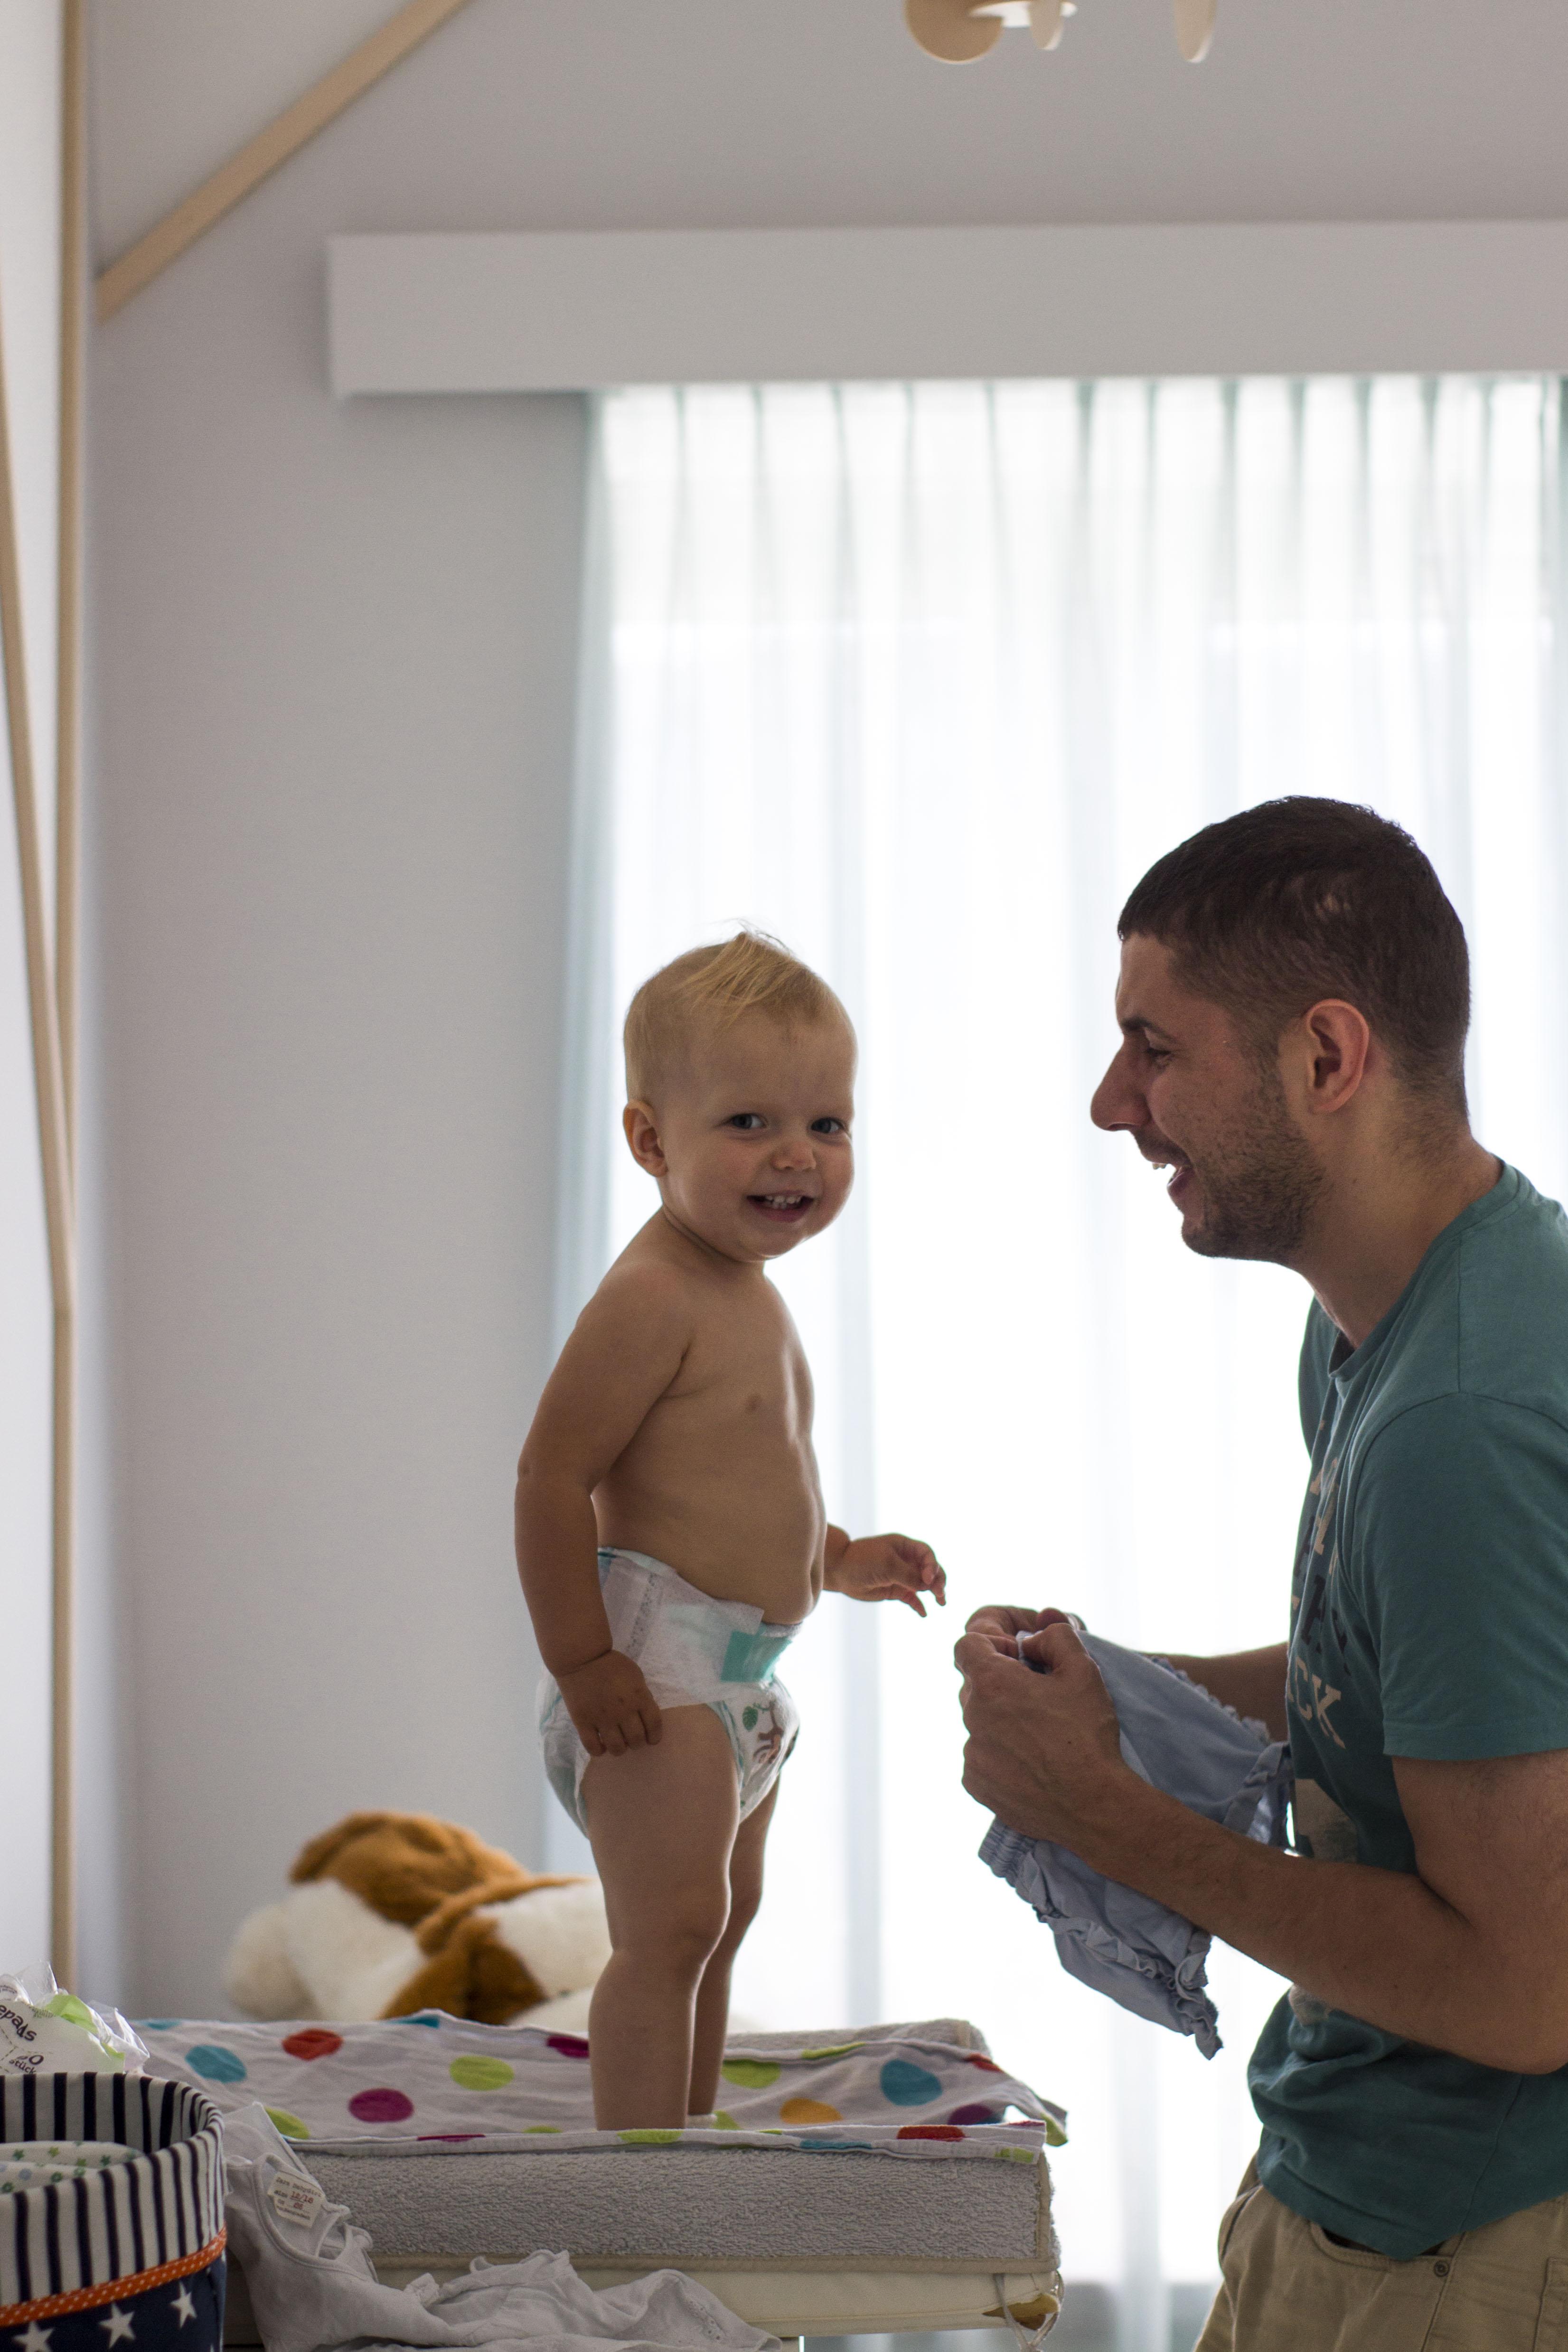 fotograf trojmiasto sesja rodzinna fotografia naturalna dziecięca